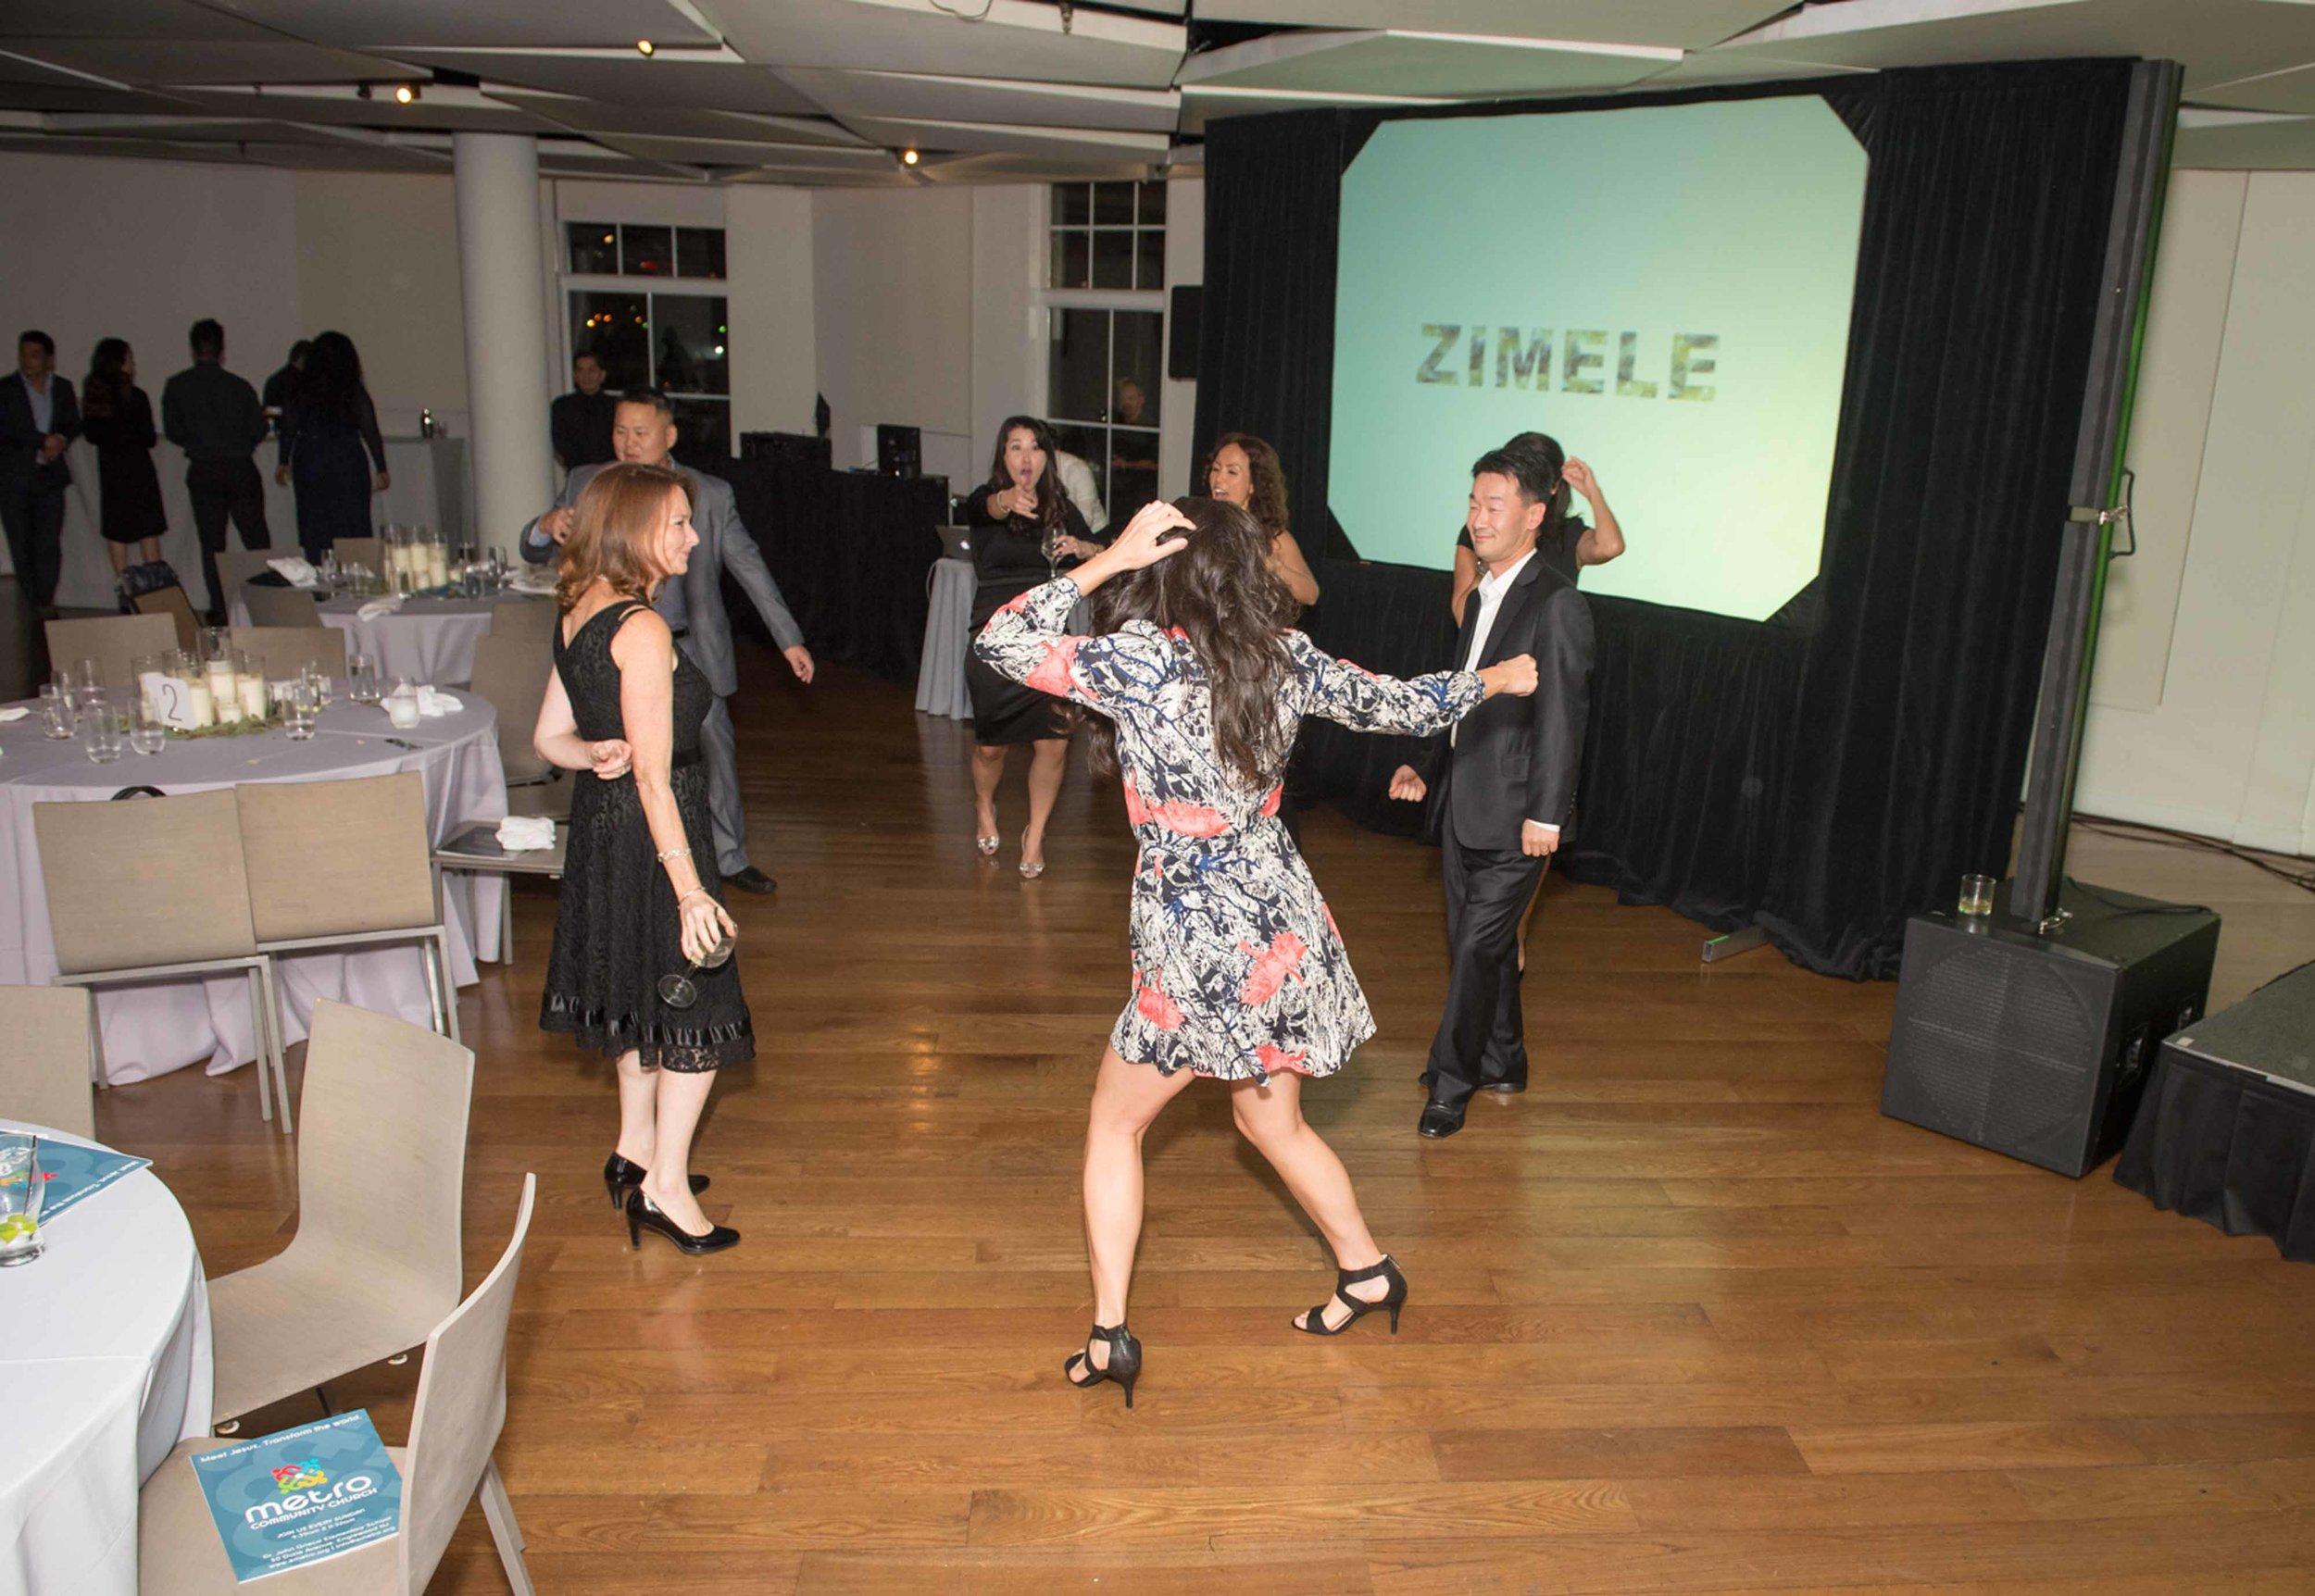 2017-10-21 Zimele USA 6th Annual Gala - Maritime Parc - Jersey City NJ_0350.jpg